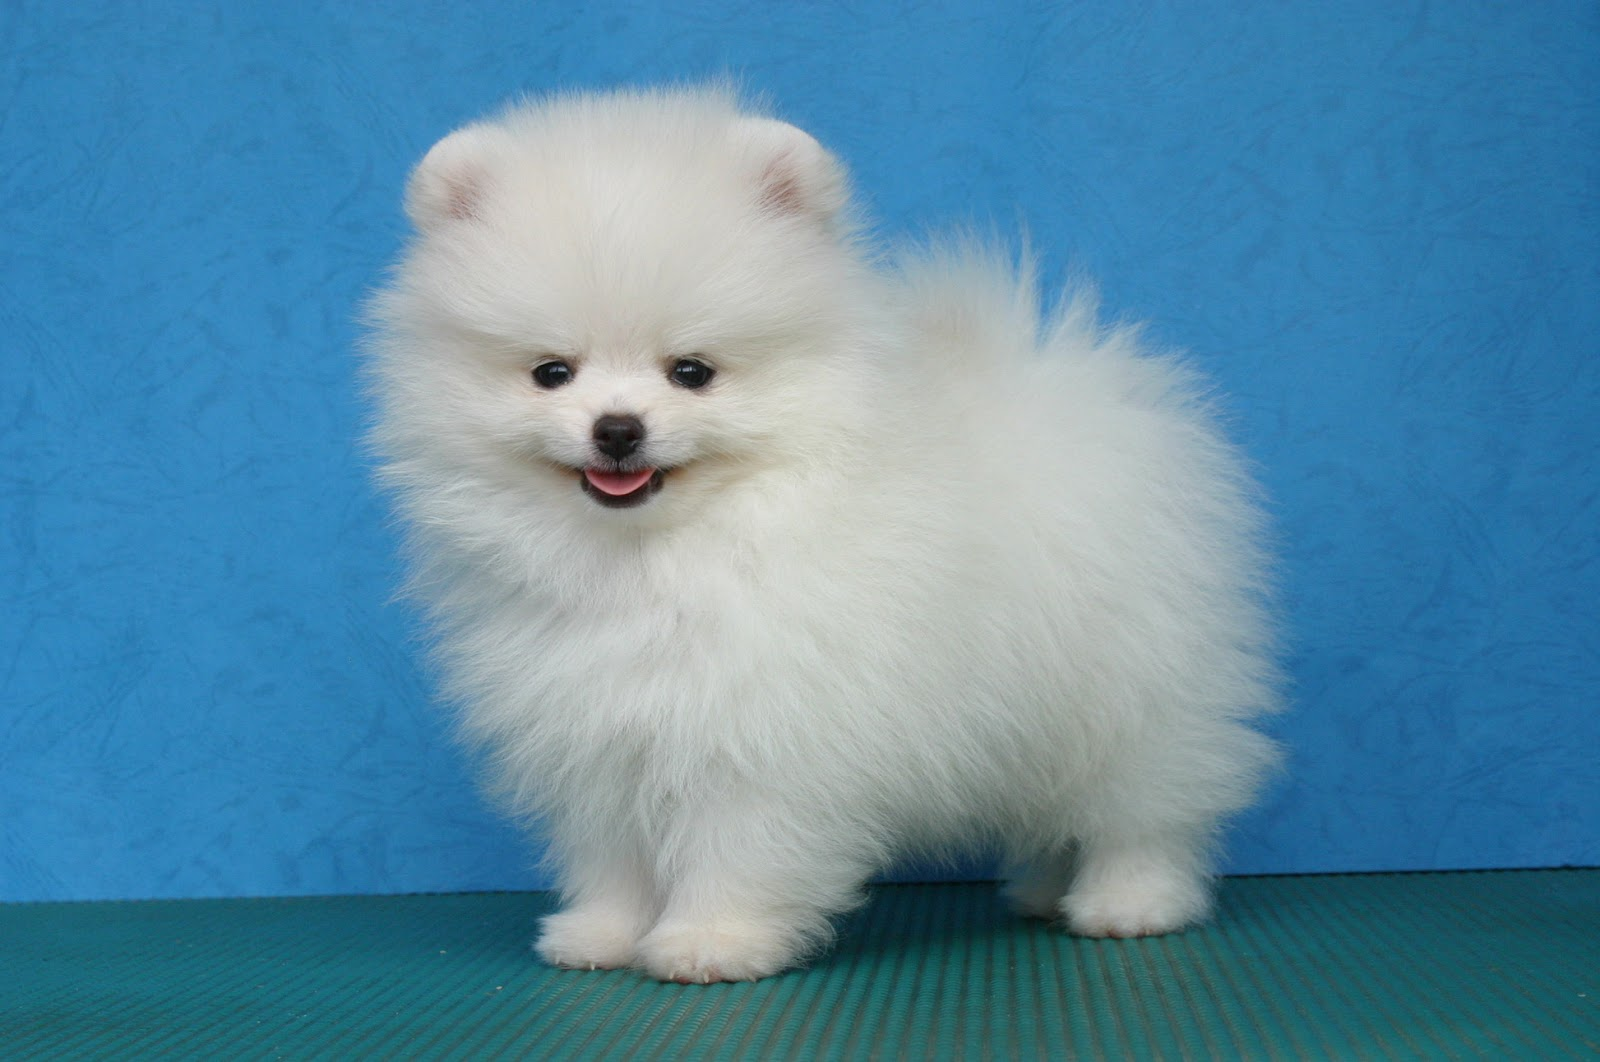 White Teacup Pomeranian Wallpaper Download